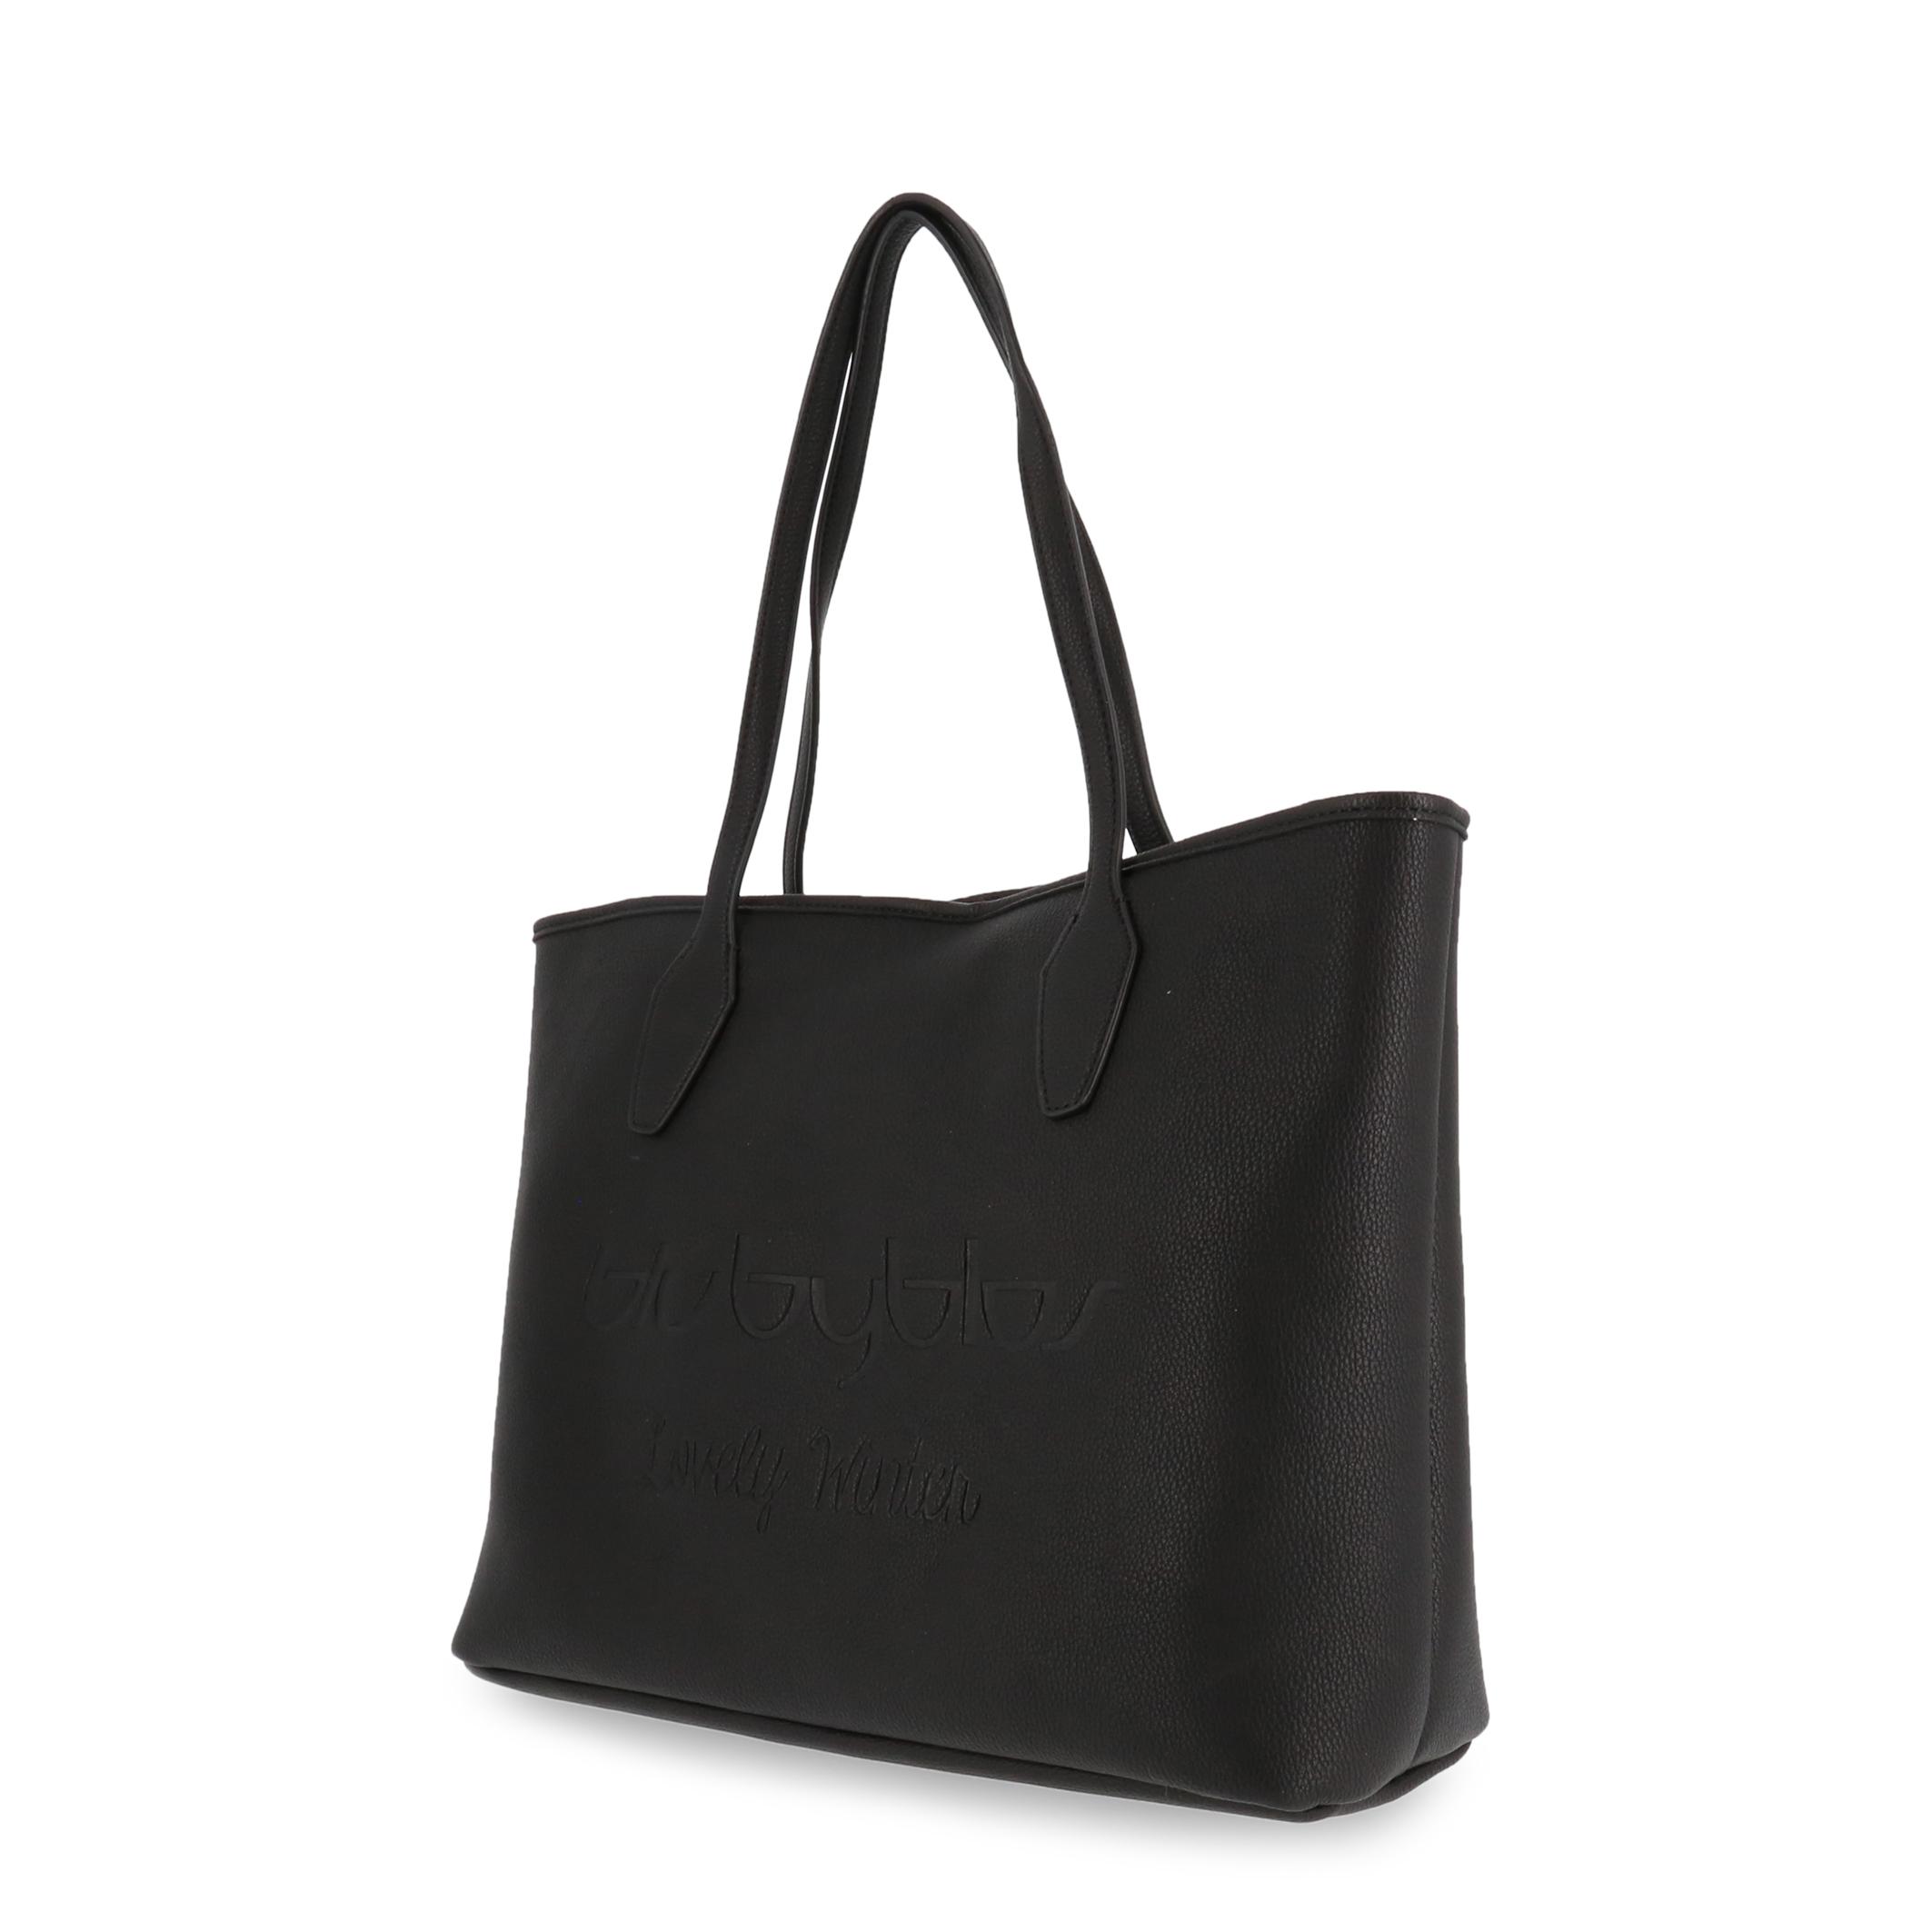 Shopping bag Blu Byblos LOVELYWINTER_685900 Donna Nero 95122